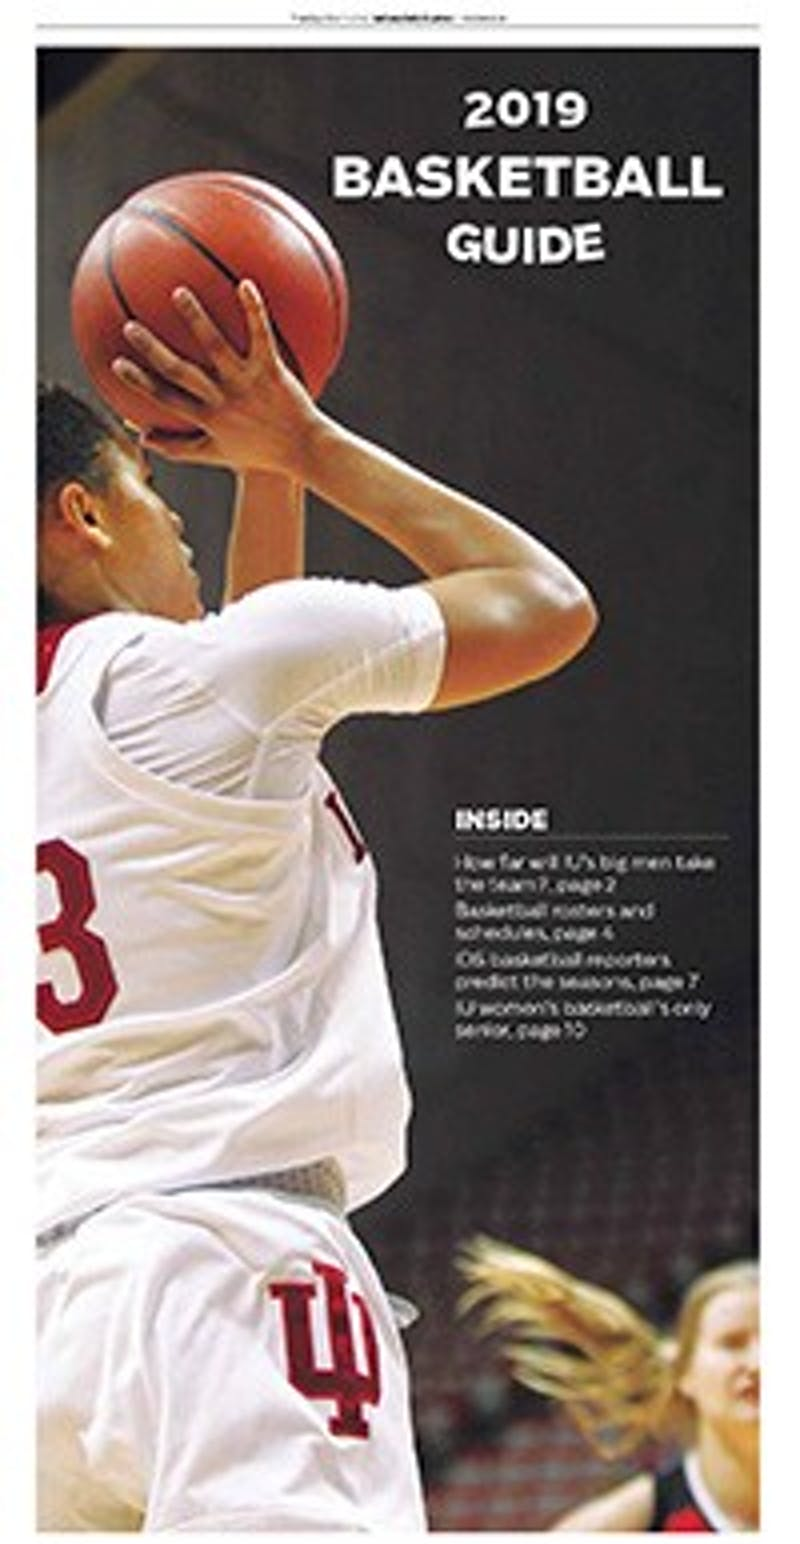 2019 Basketball Guide